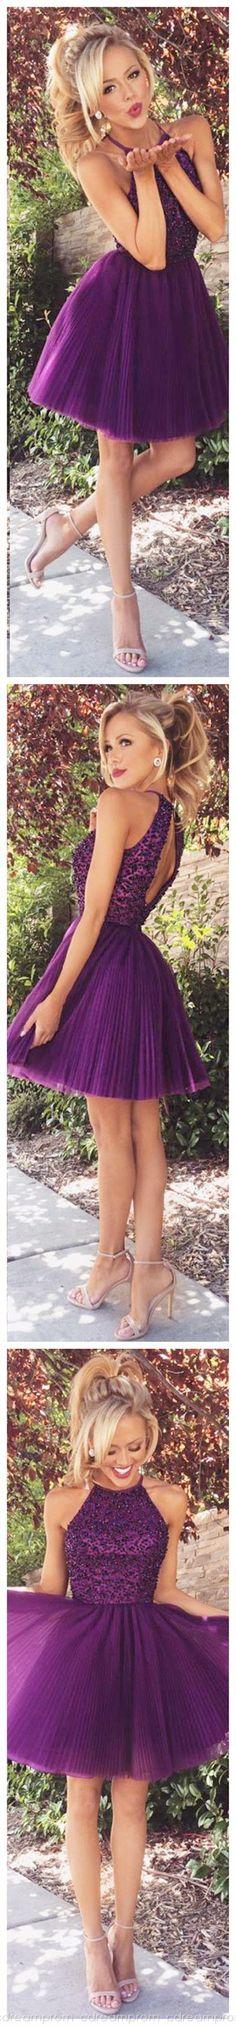 short dress prom dress homecoming dress